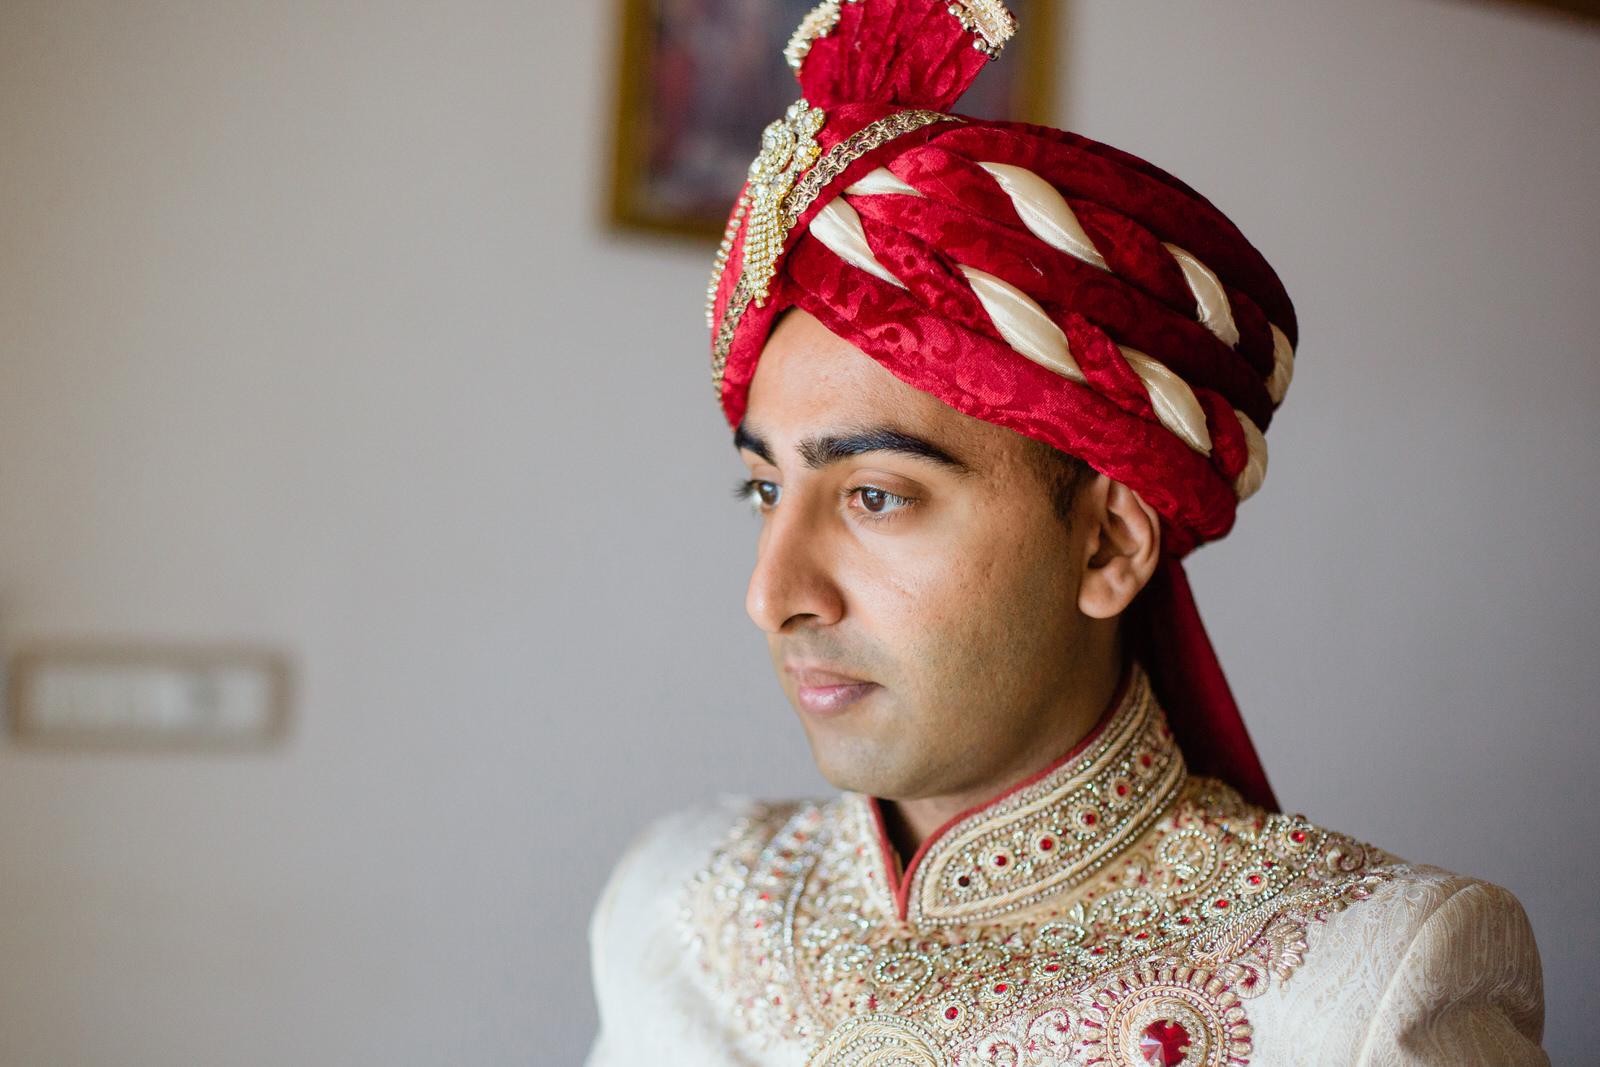 destination-wedding-photographer-Kerala-india-19.JPG